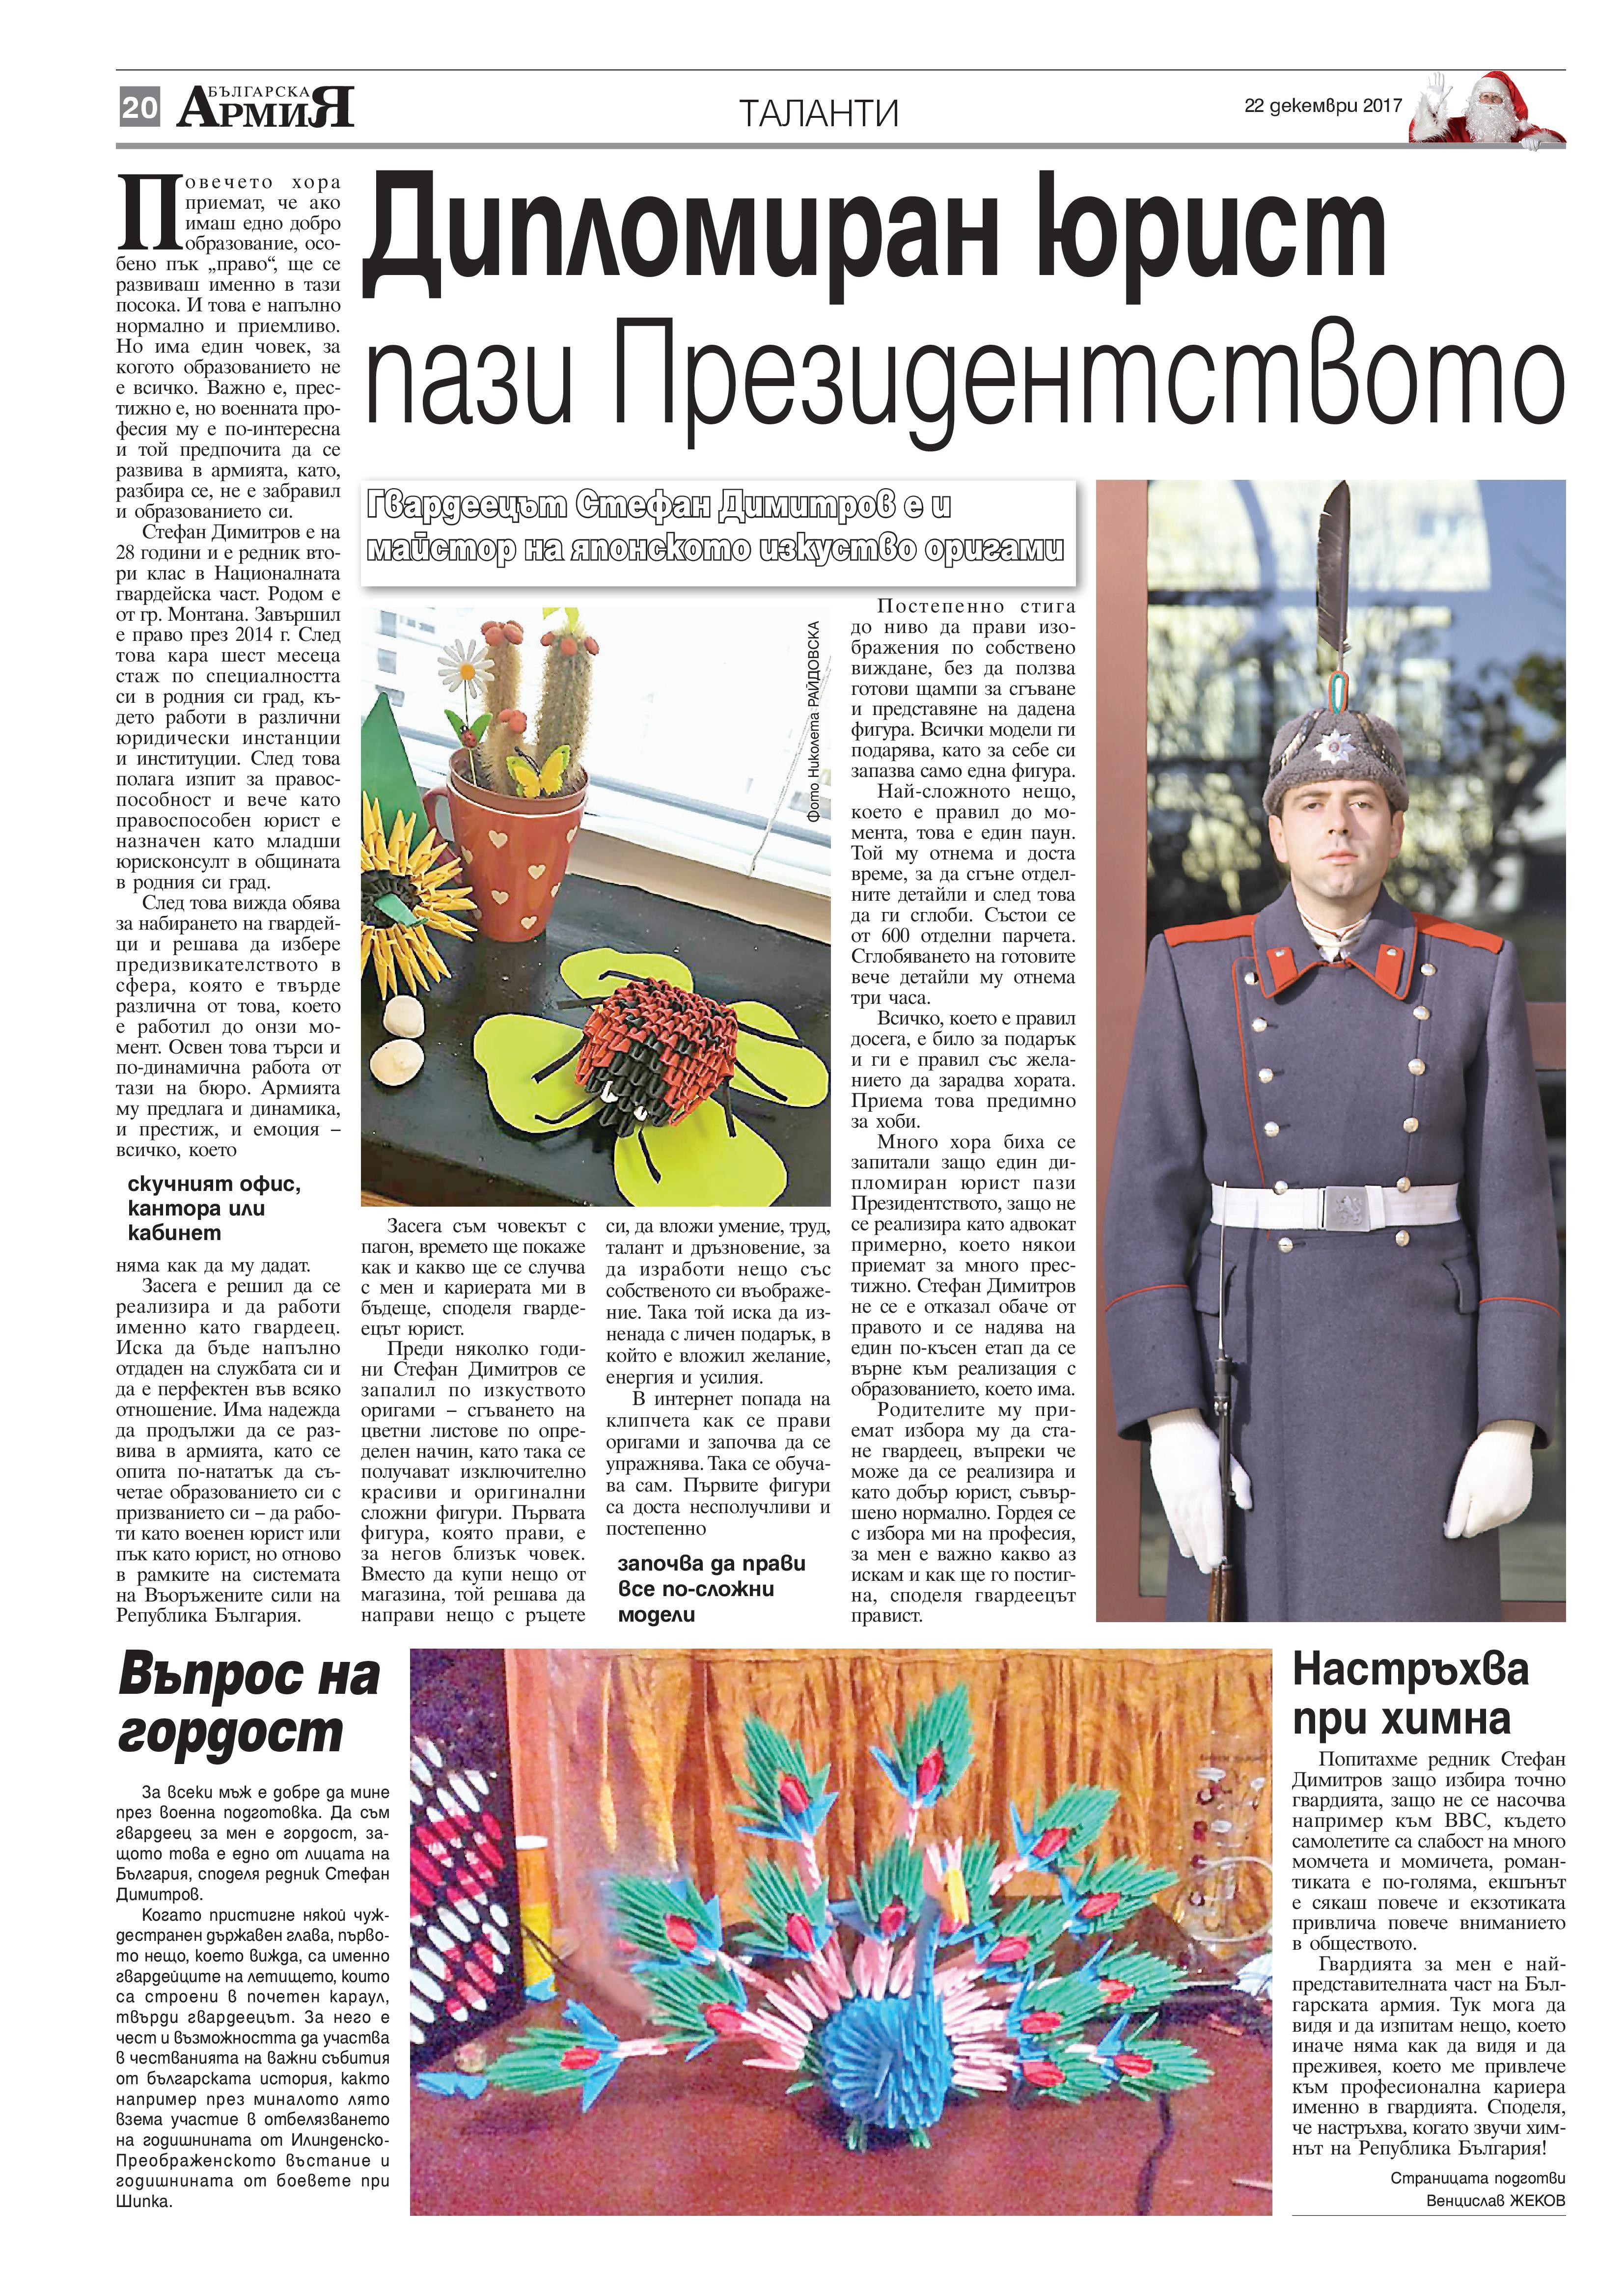 http://armymedia.bg/wp-content/uploads/2015/06/20-16.jpg